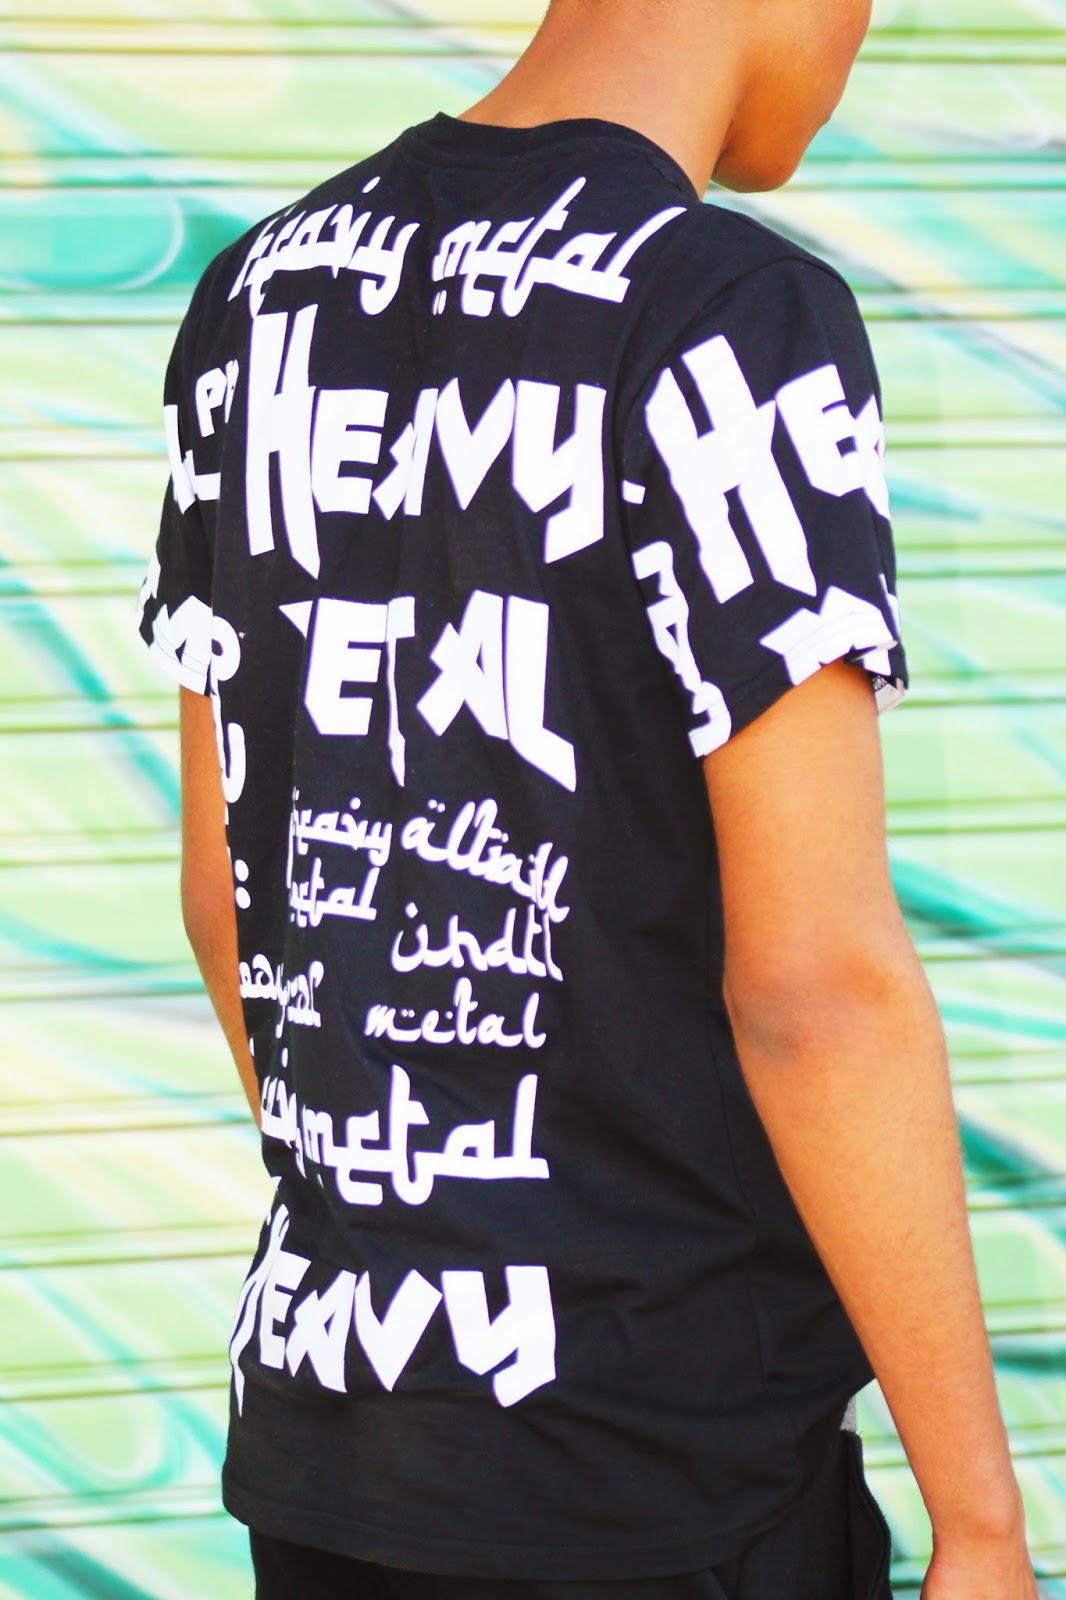 http://www.persunmall.com/p/heavy-rock-letter-print-tshirt-p-26331.html